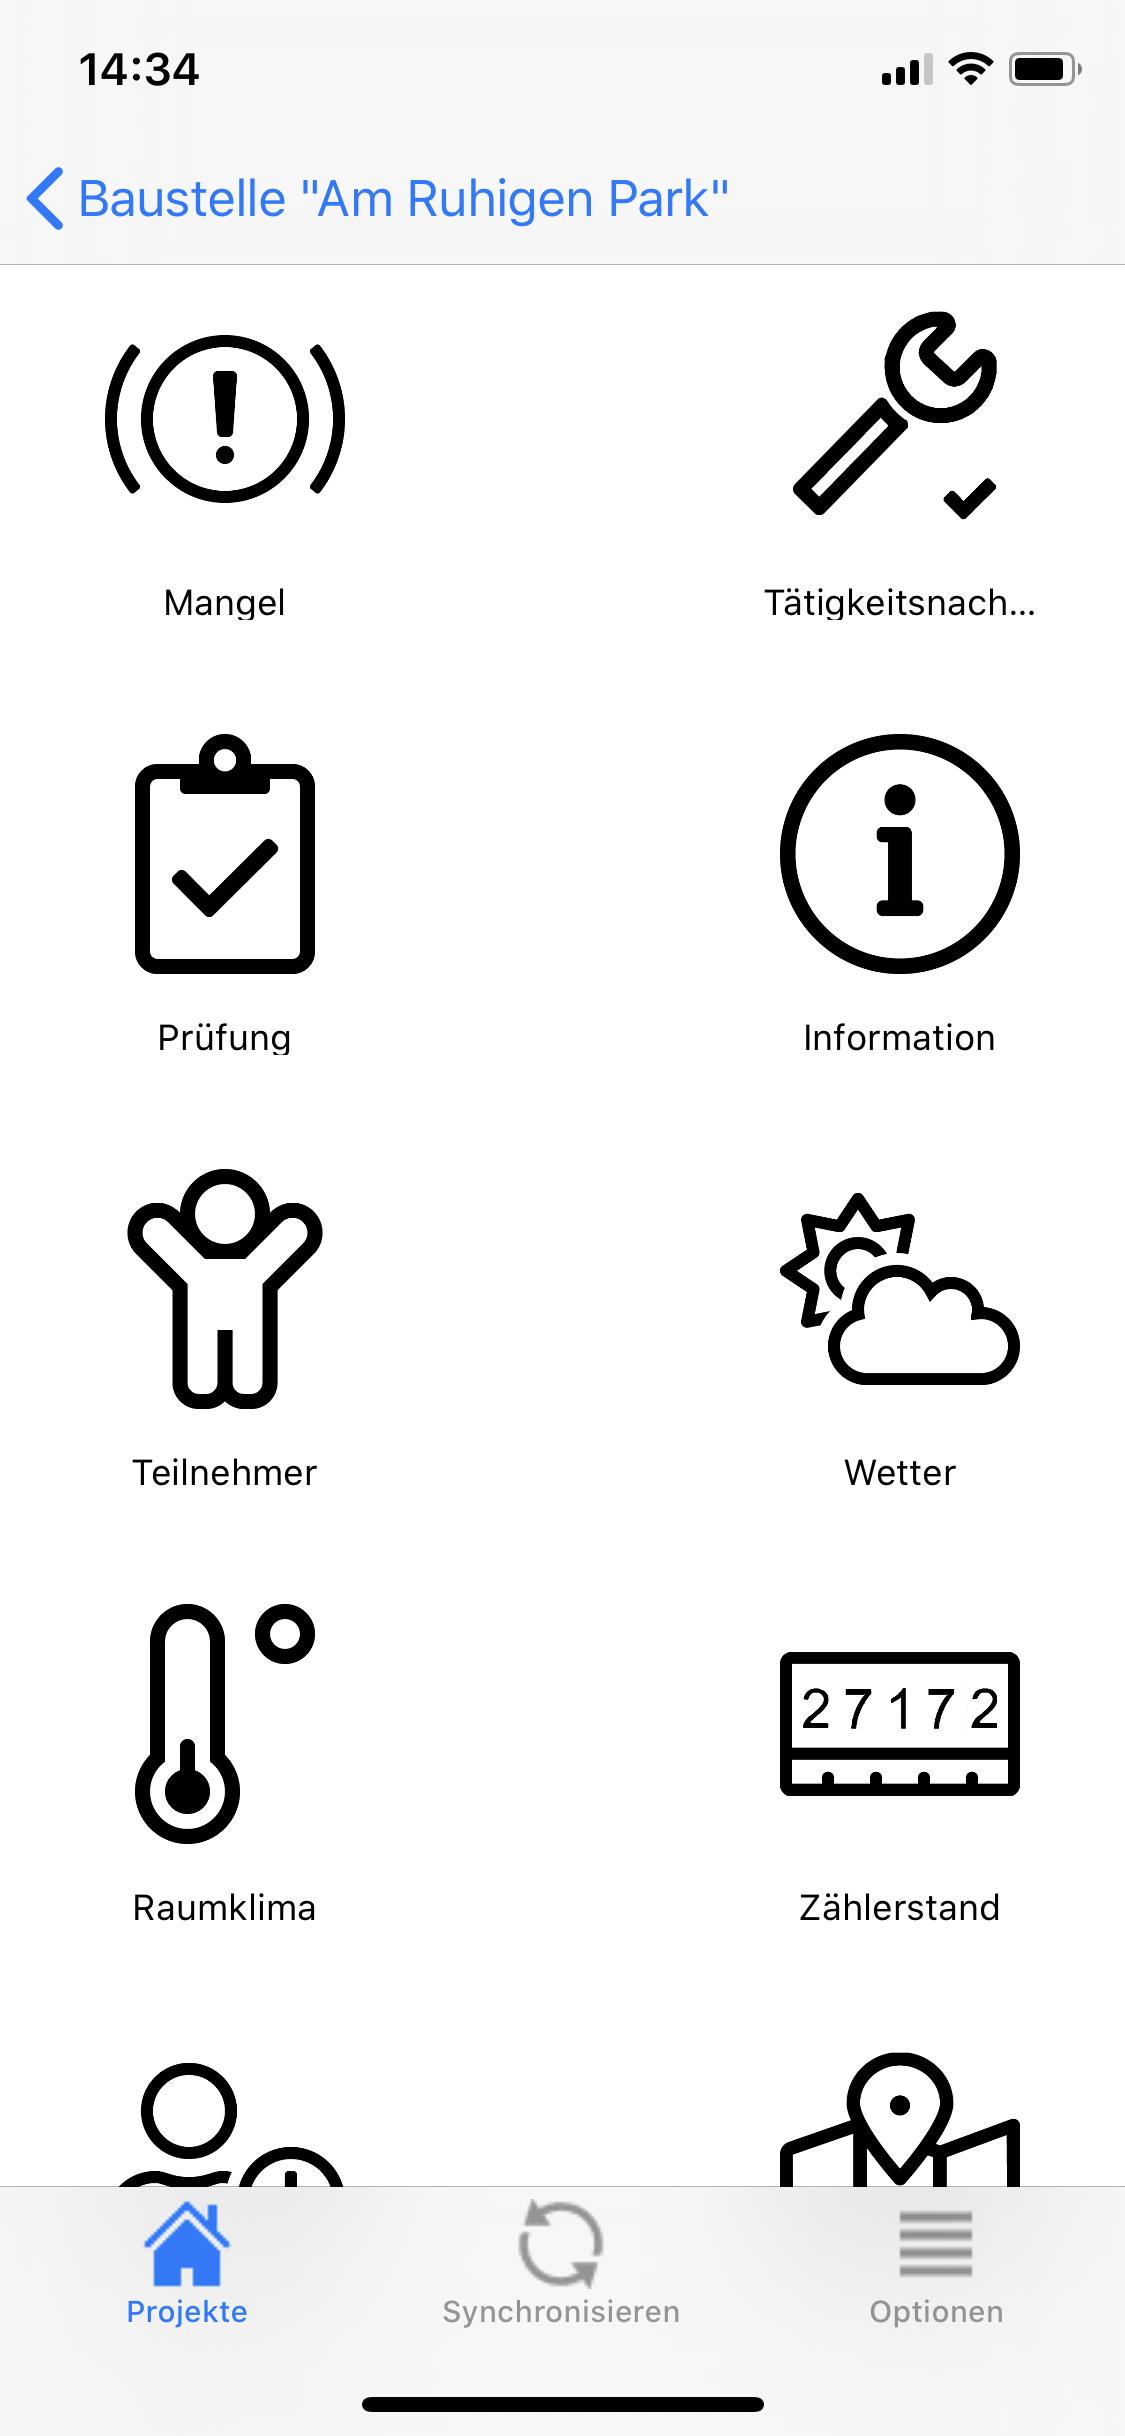 Fotodokumentation App Baustelle Mängel Wetter Information Raumklima